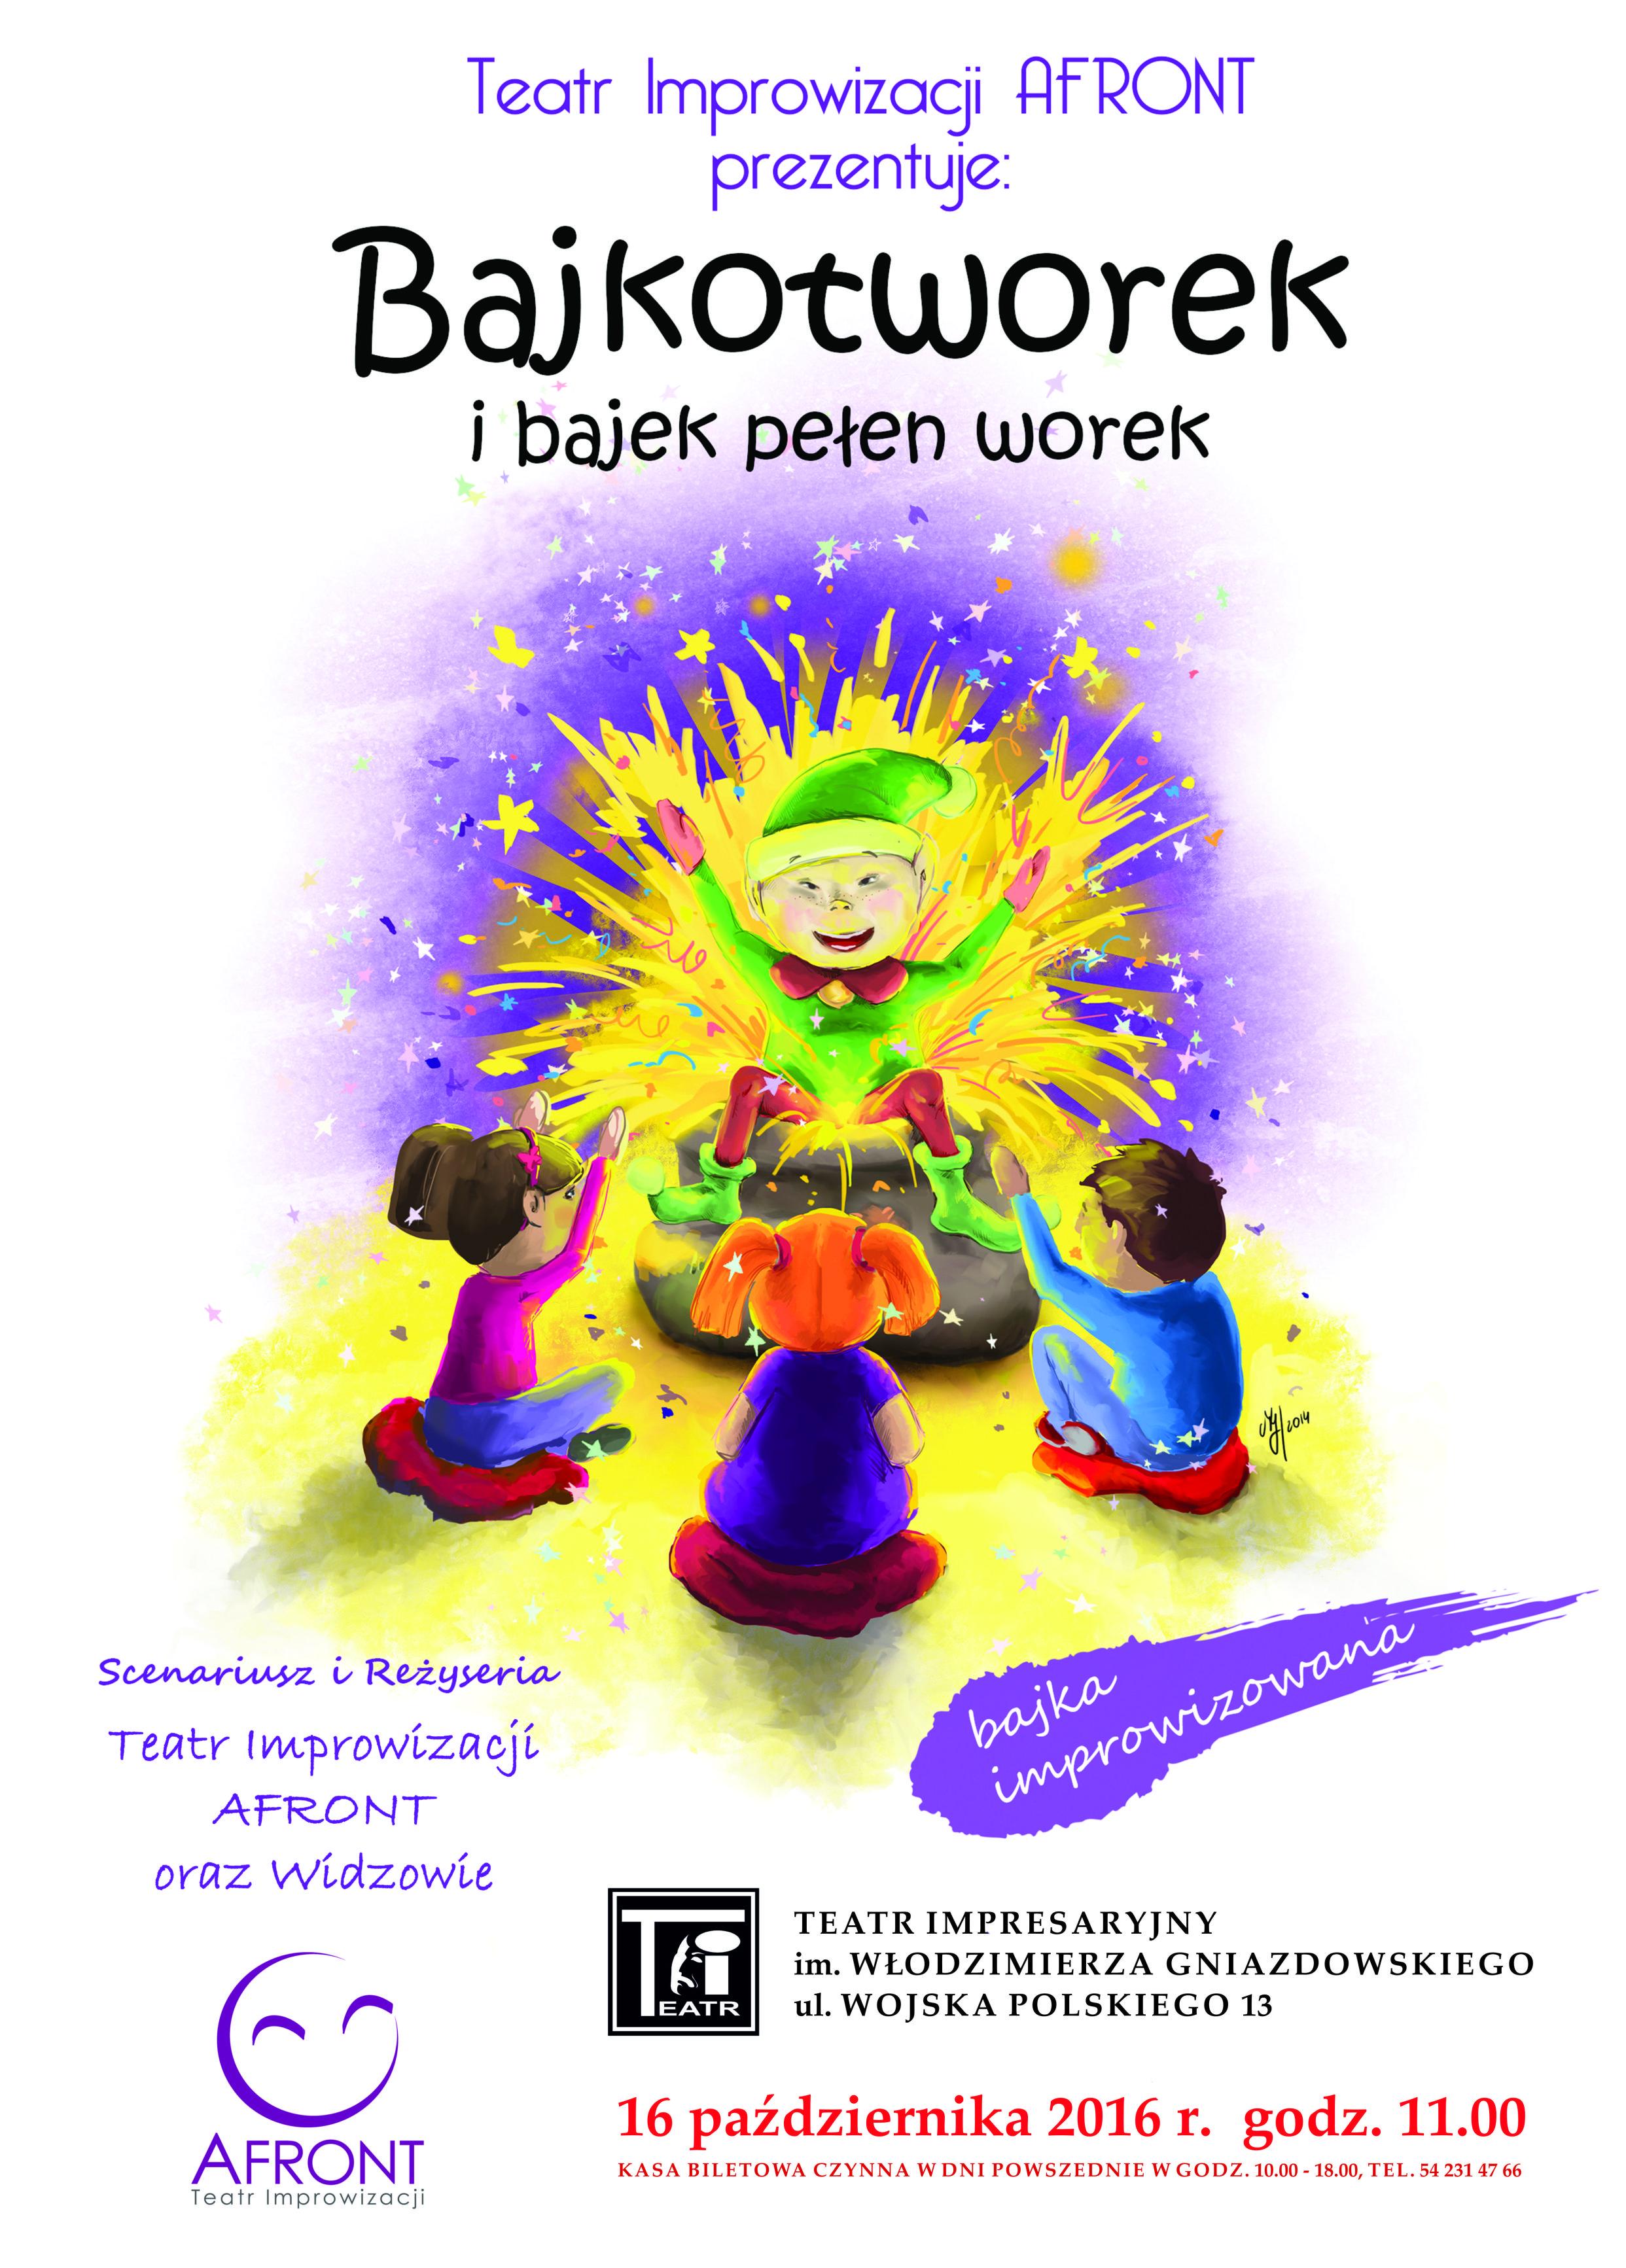 Bajkotworek I Bajek Pełen Worek Teatr Impresaryjny Im